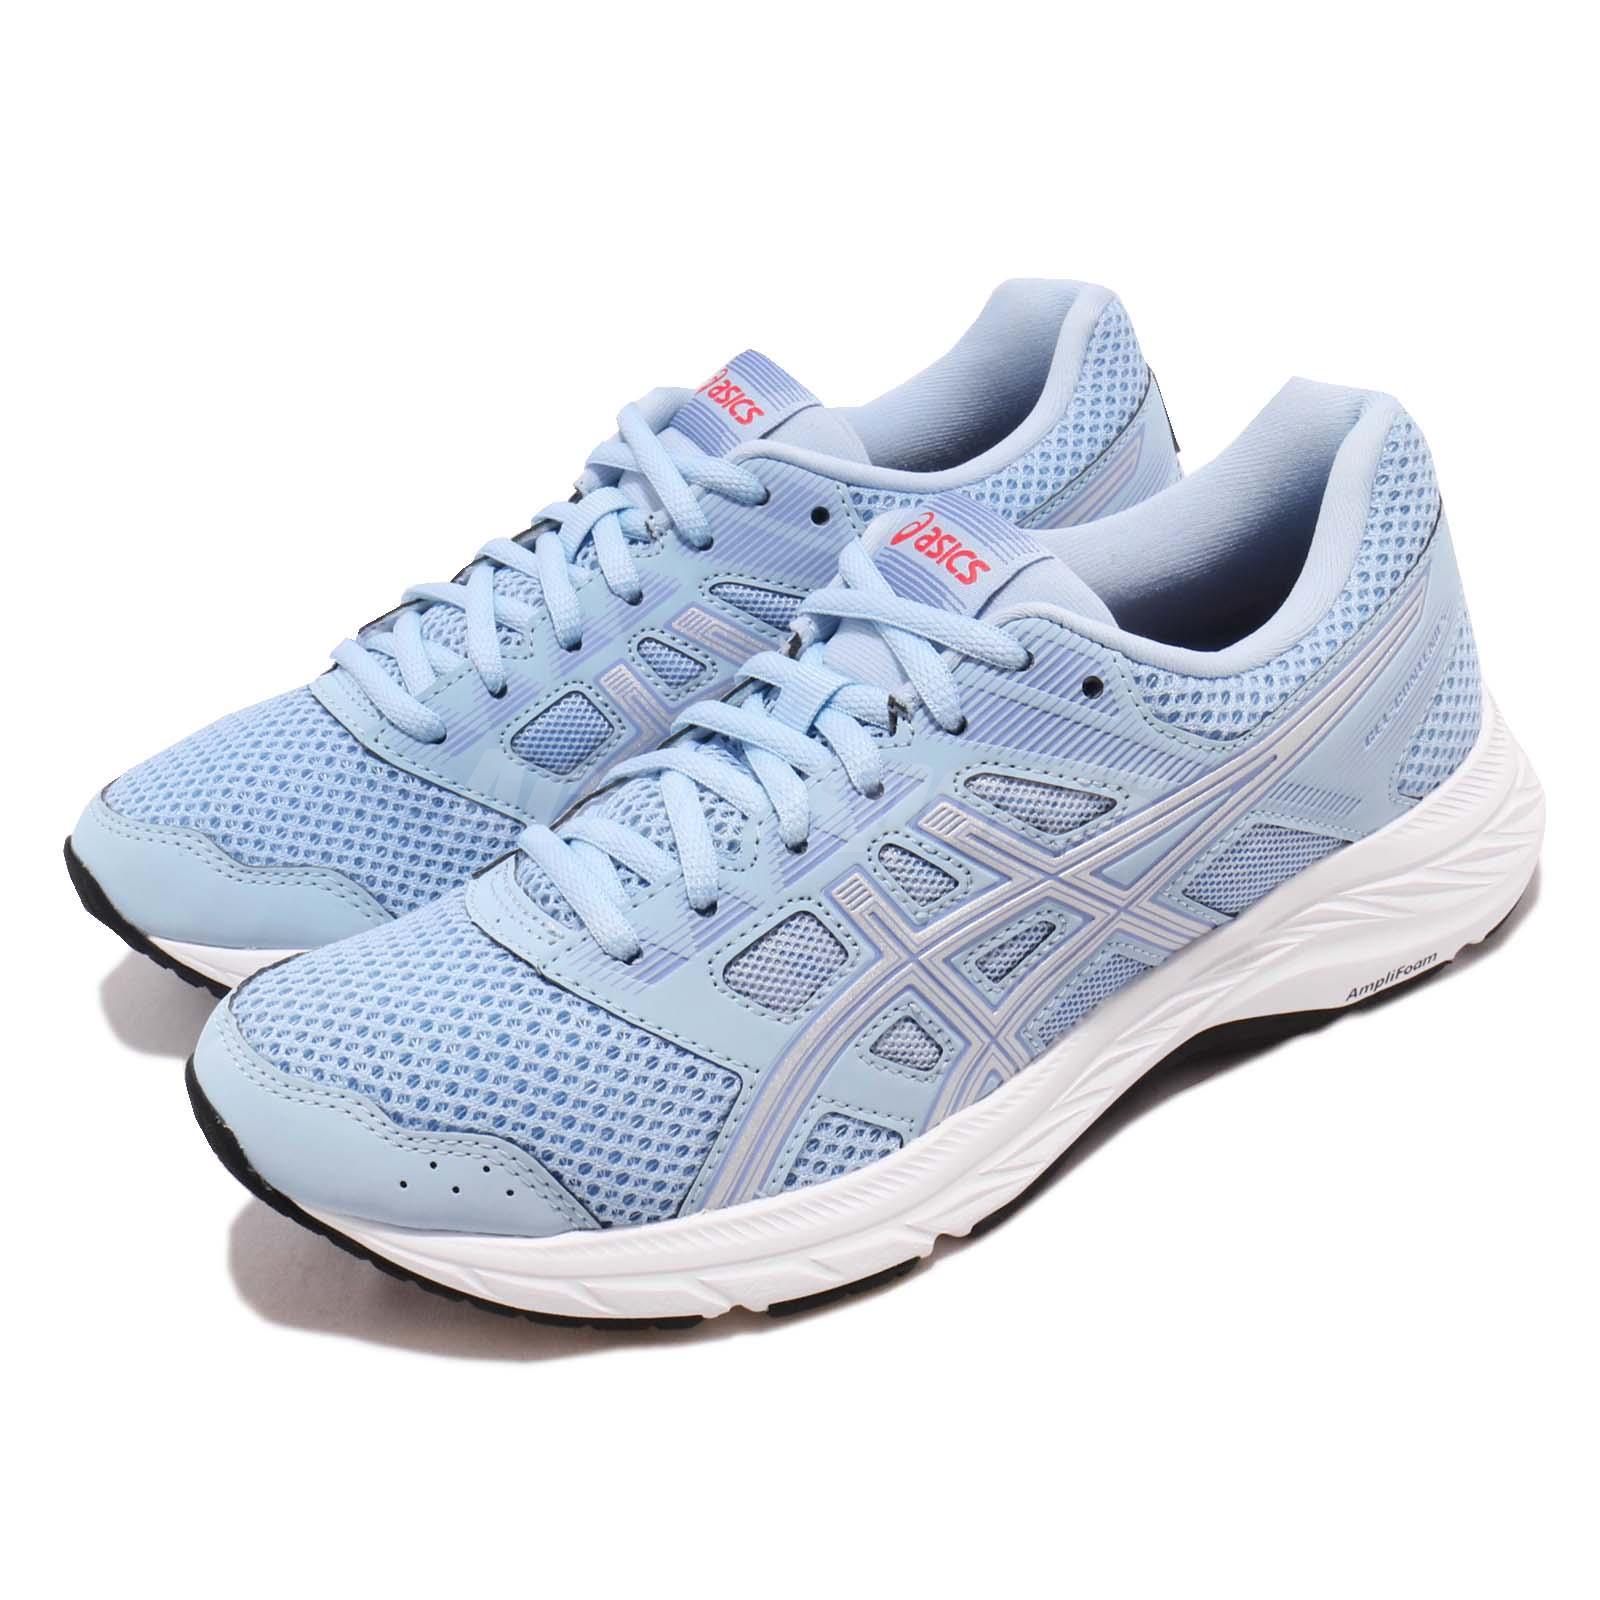 b5e5db2e8e828 Details about Asics Gel Contend 5 Skylight Silver Women Running Shoes  Sneakers 1012A234-400